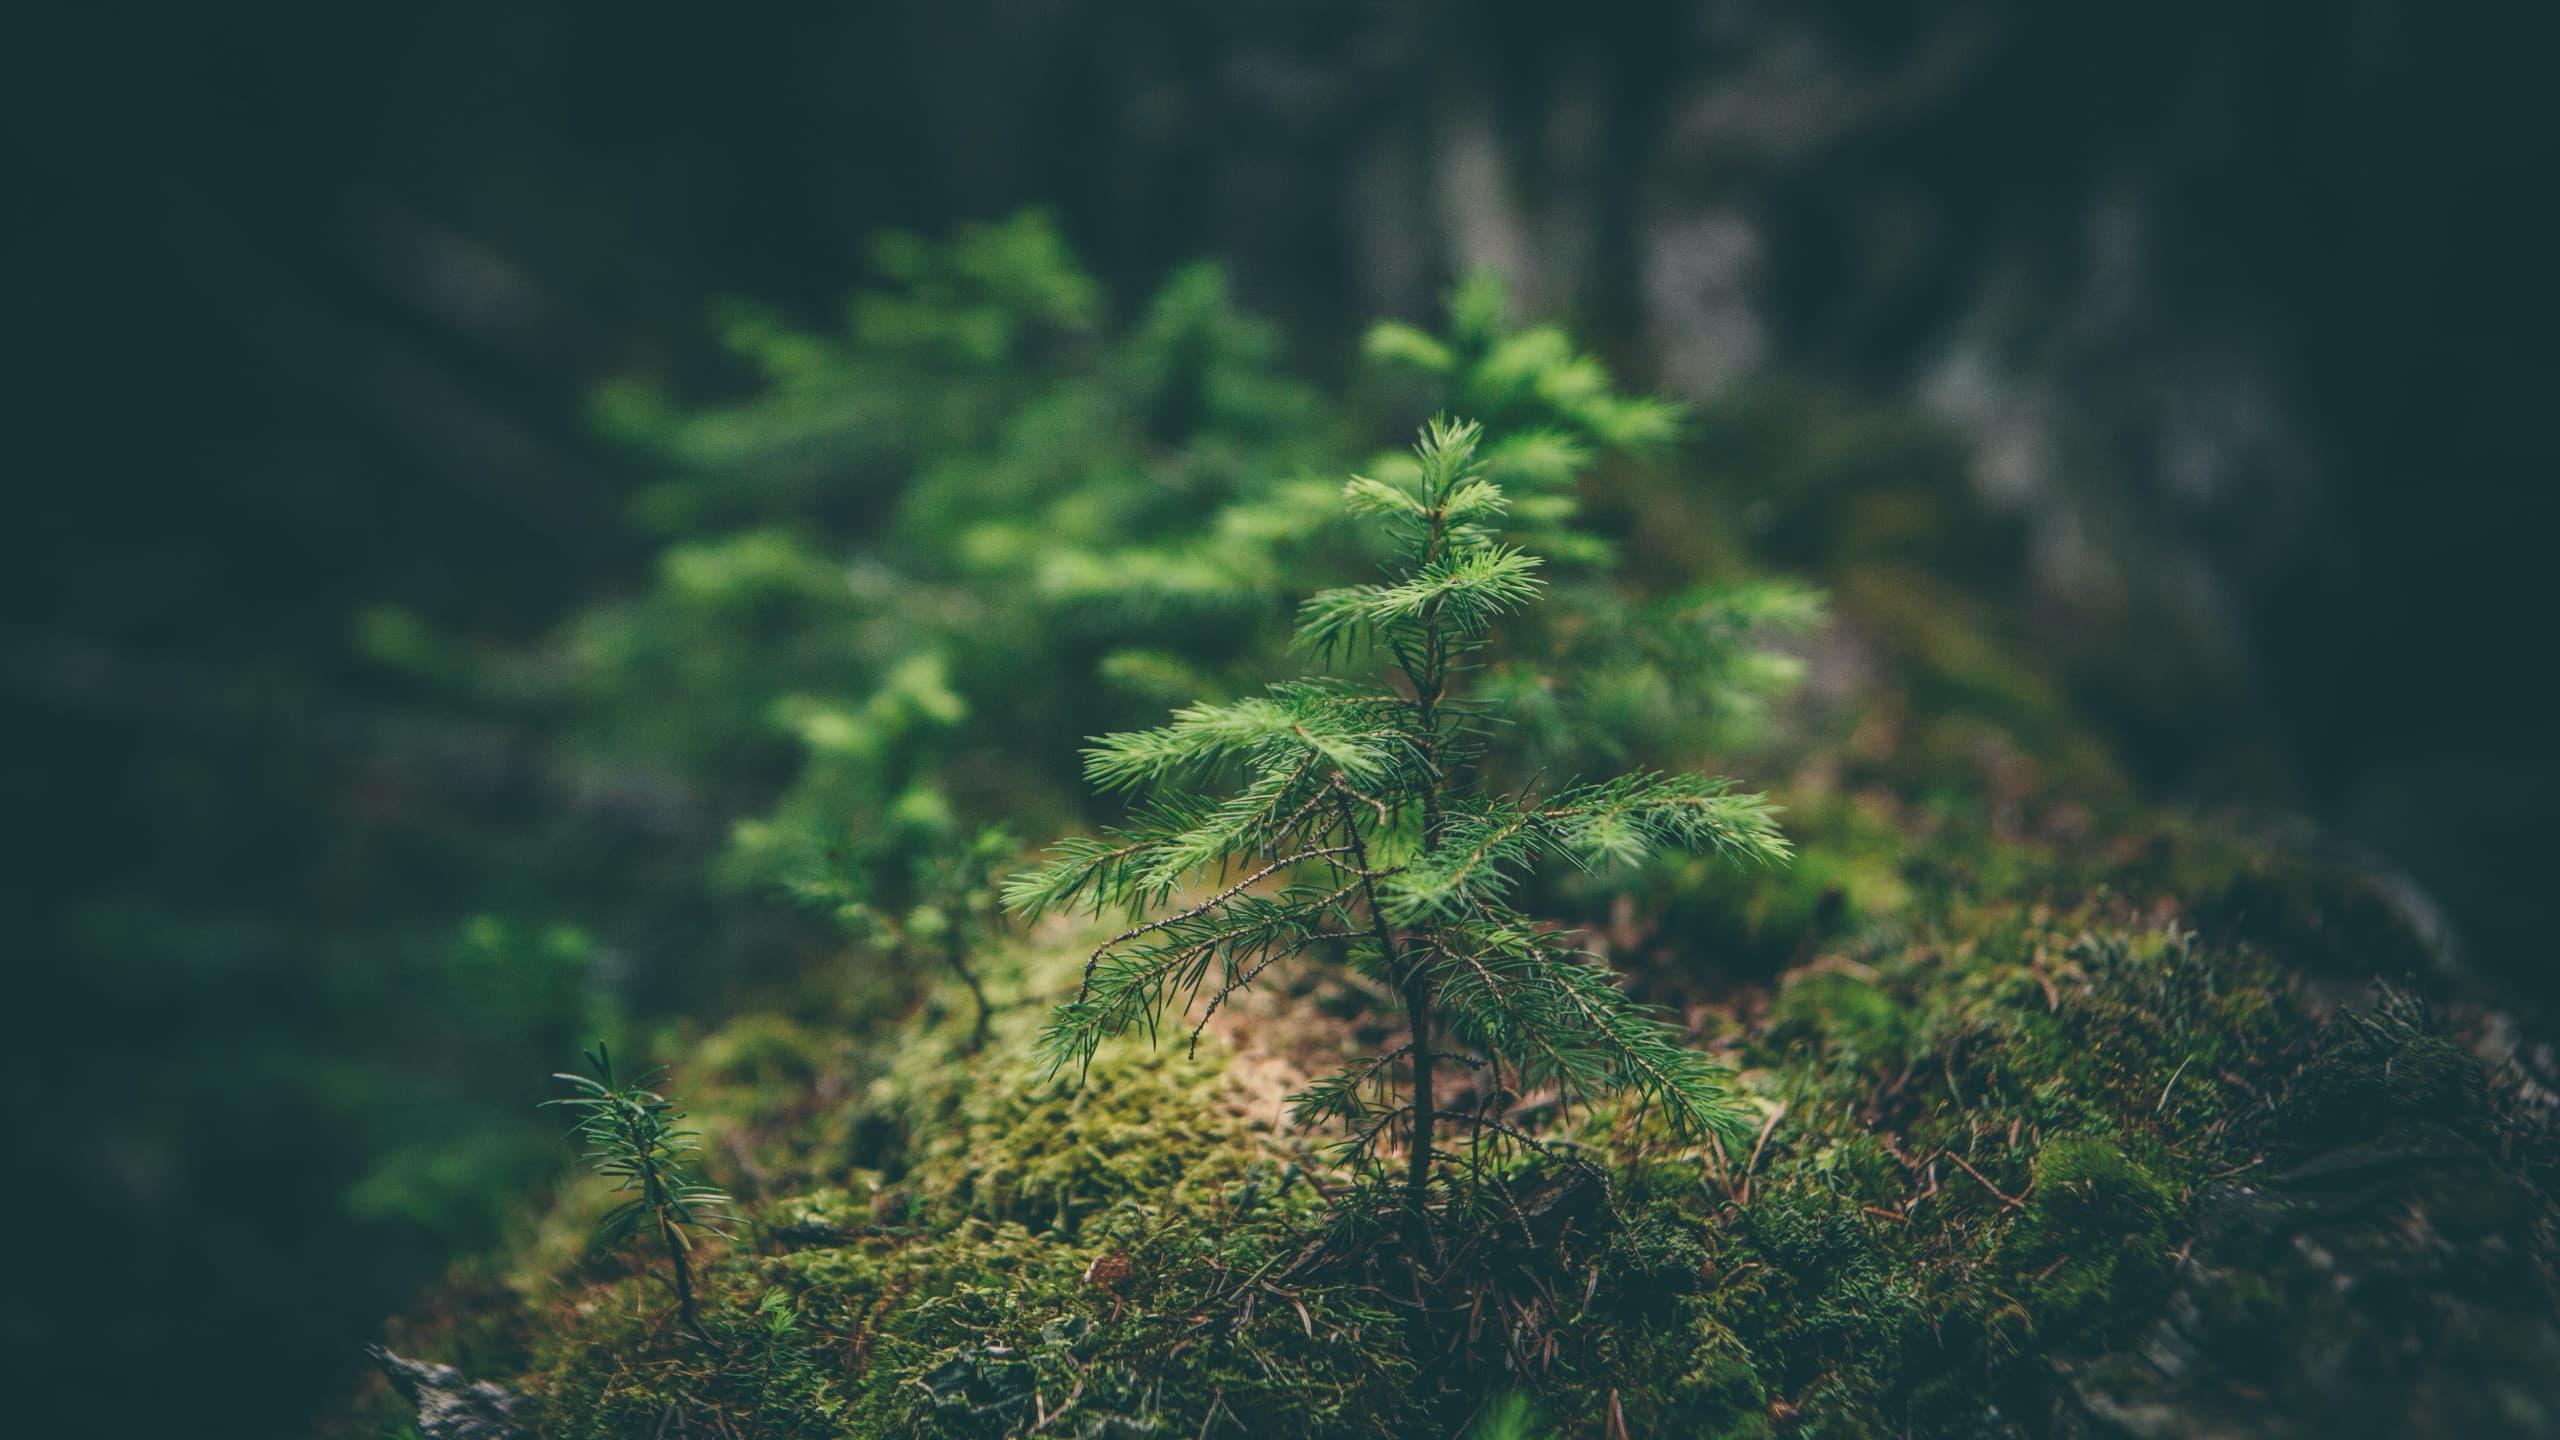 Conifer sapling by Matthew Smith